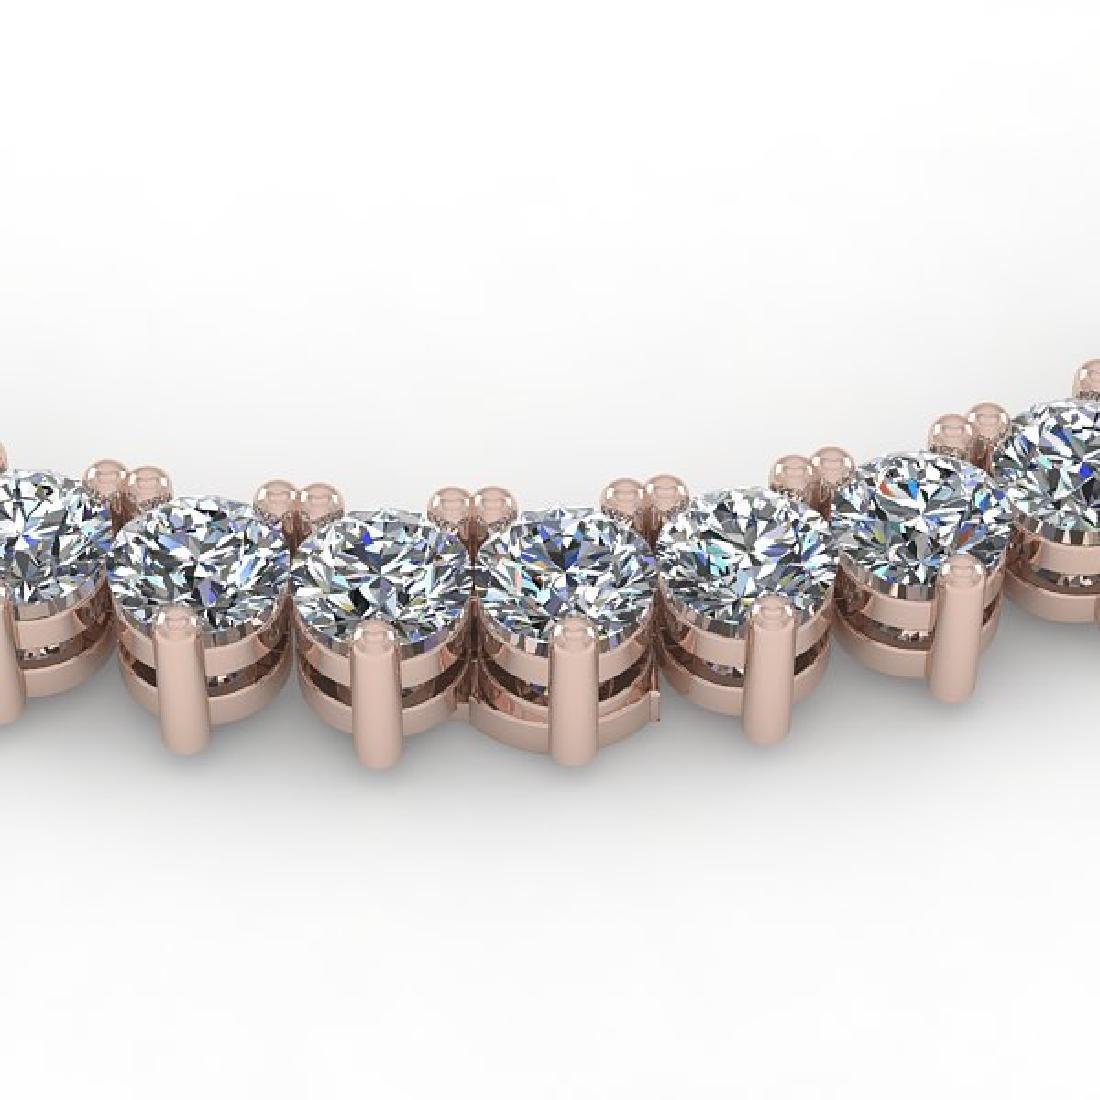 25 CTW Solitaire VS/SI Diamond Necklace 14K Rose Gold